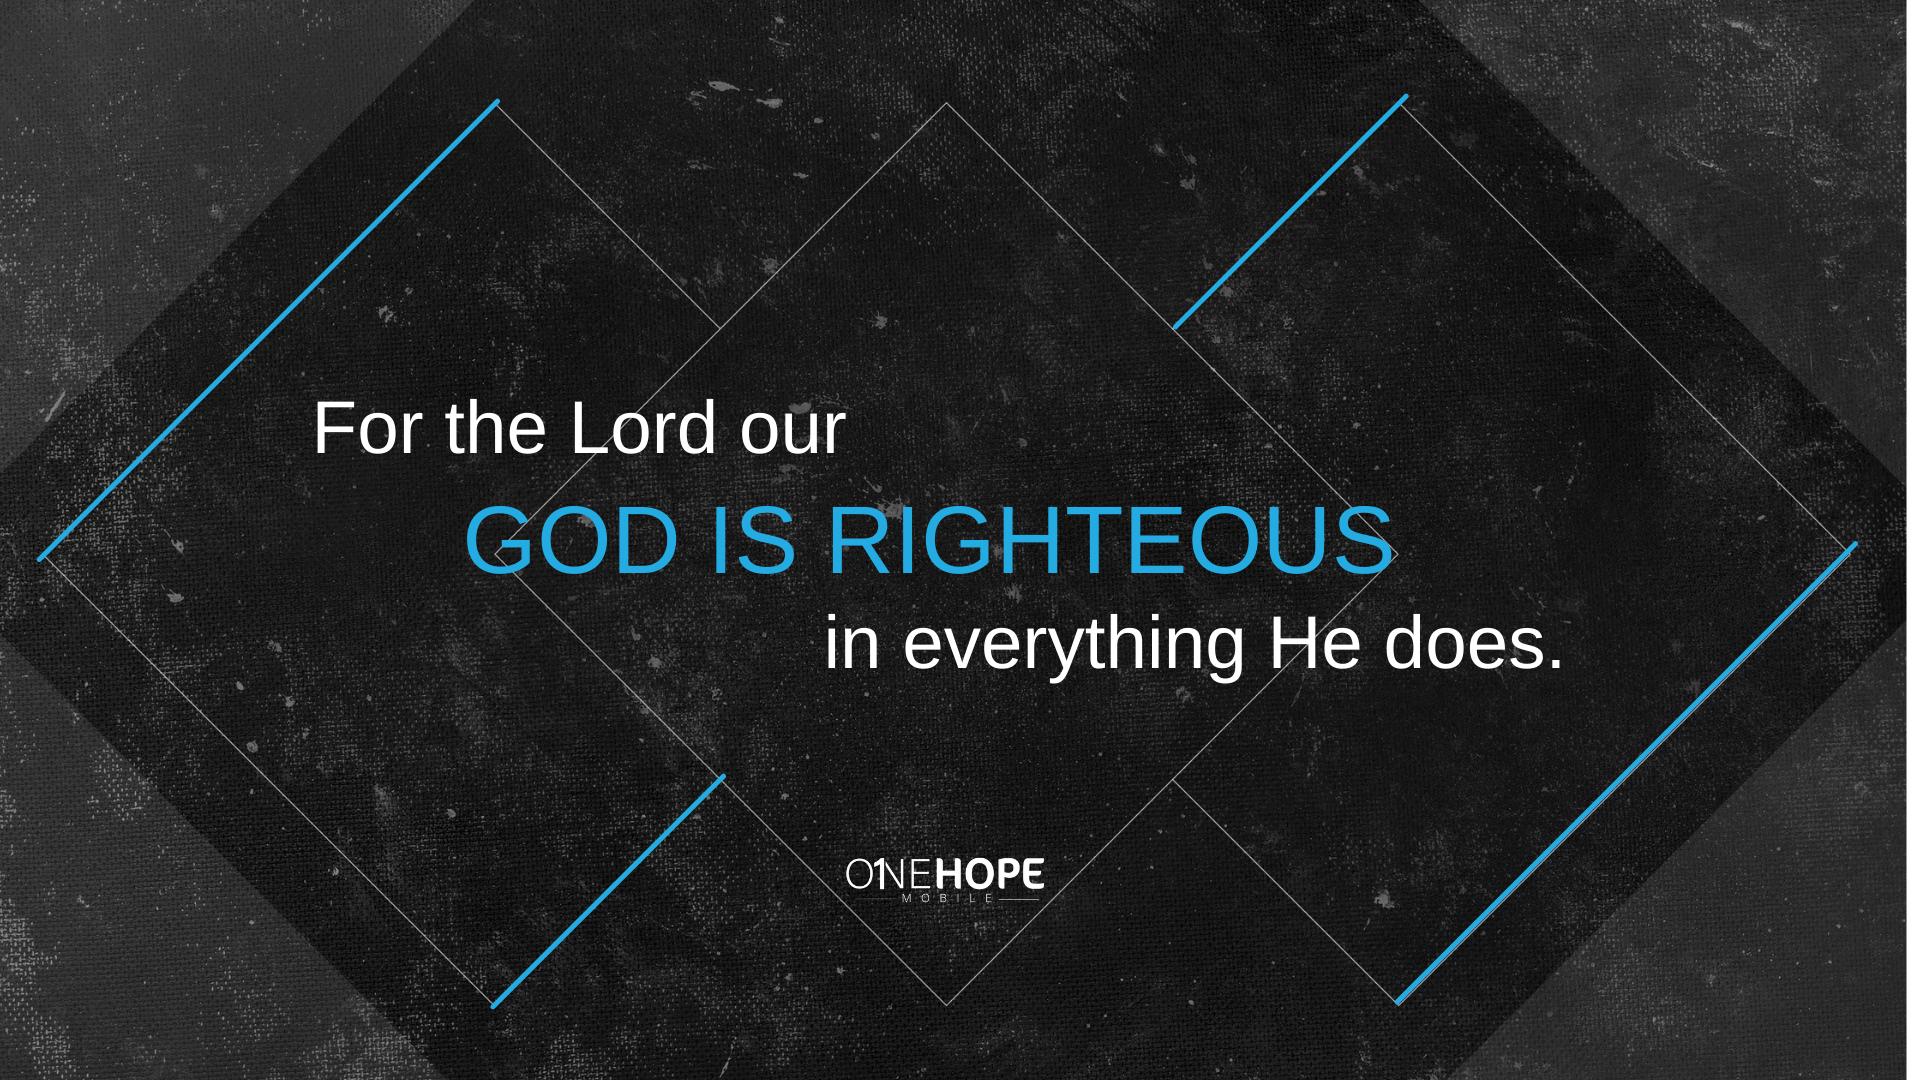 God's Righteousness is Revealed in the Gospel